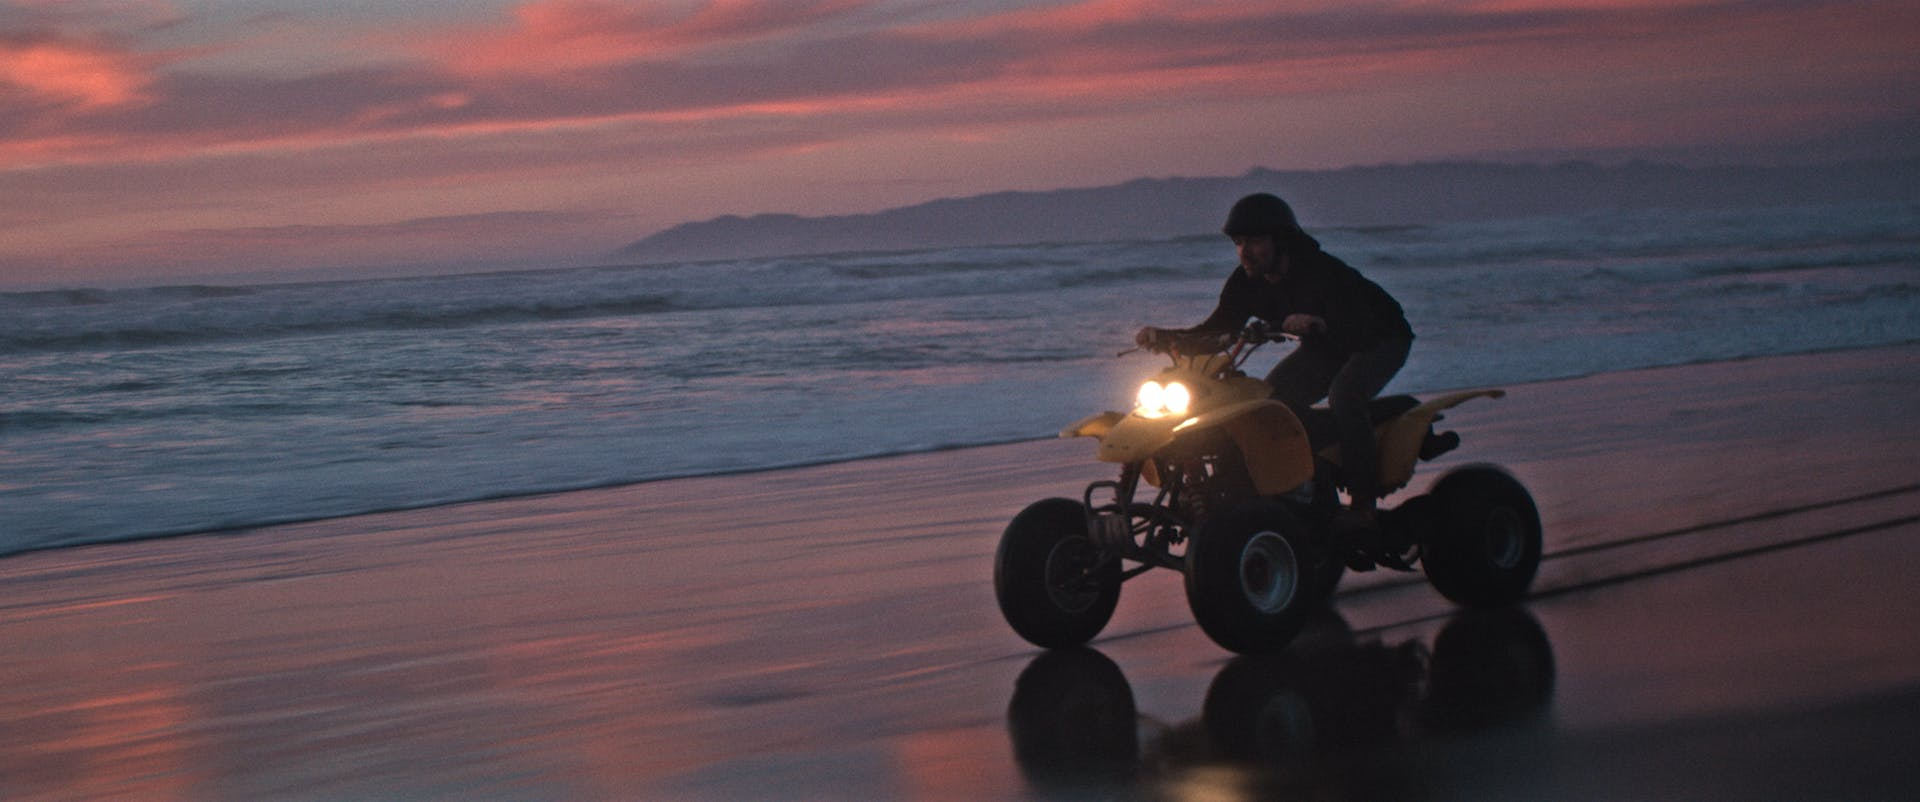 Oceano Dunes - Set Free